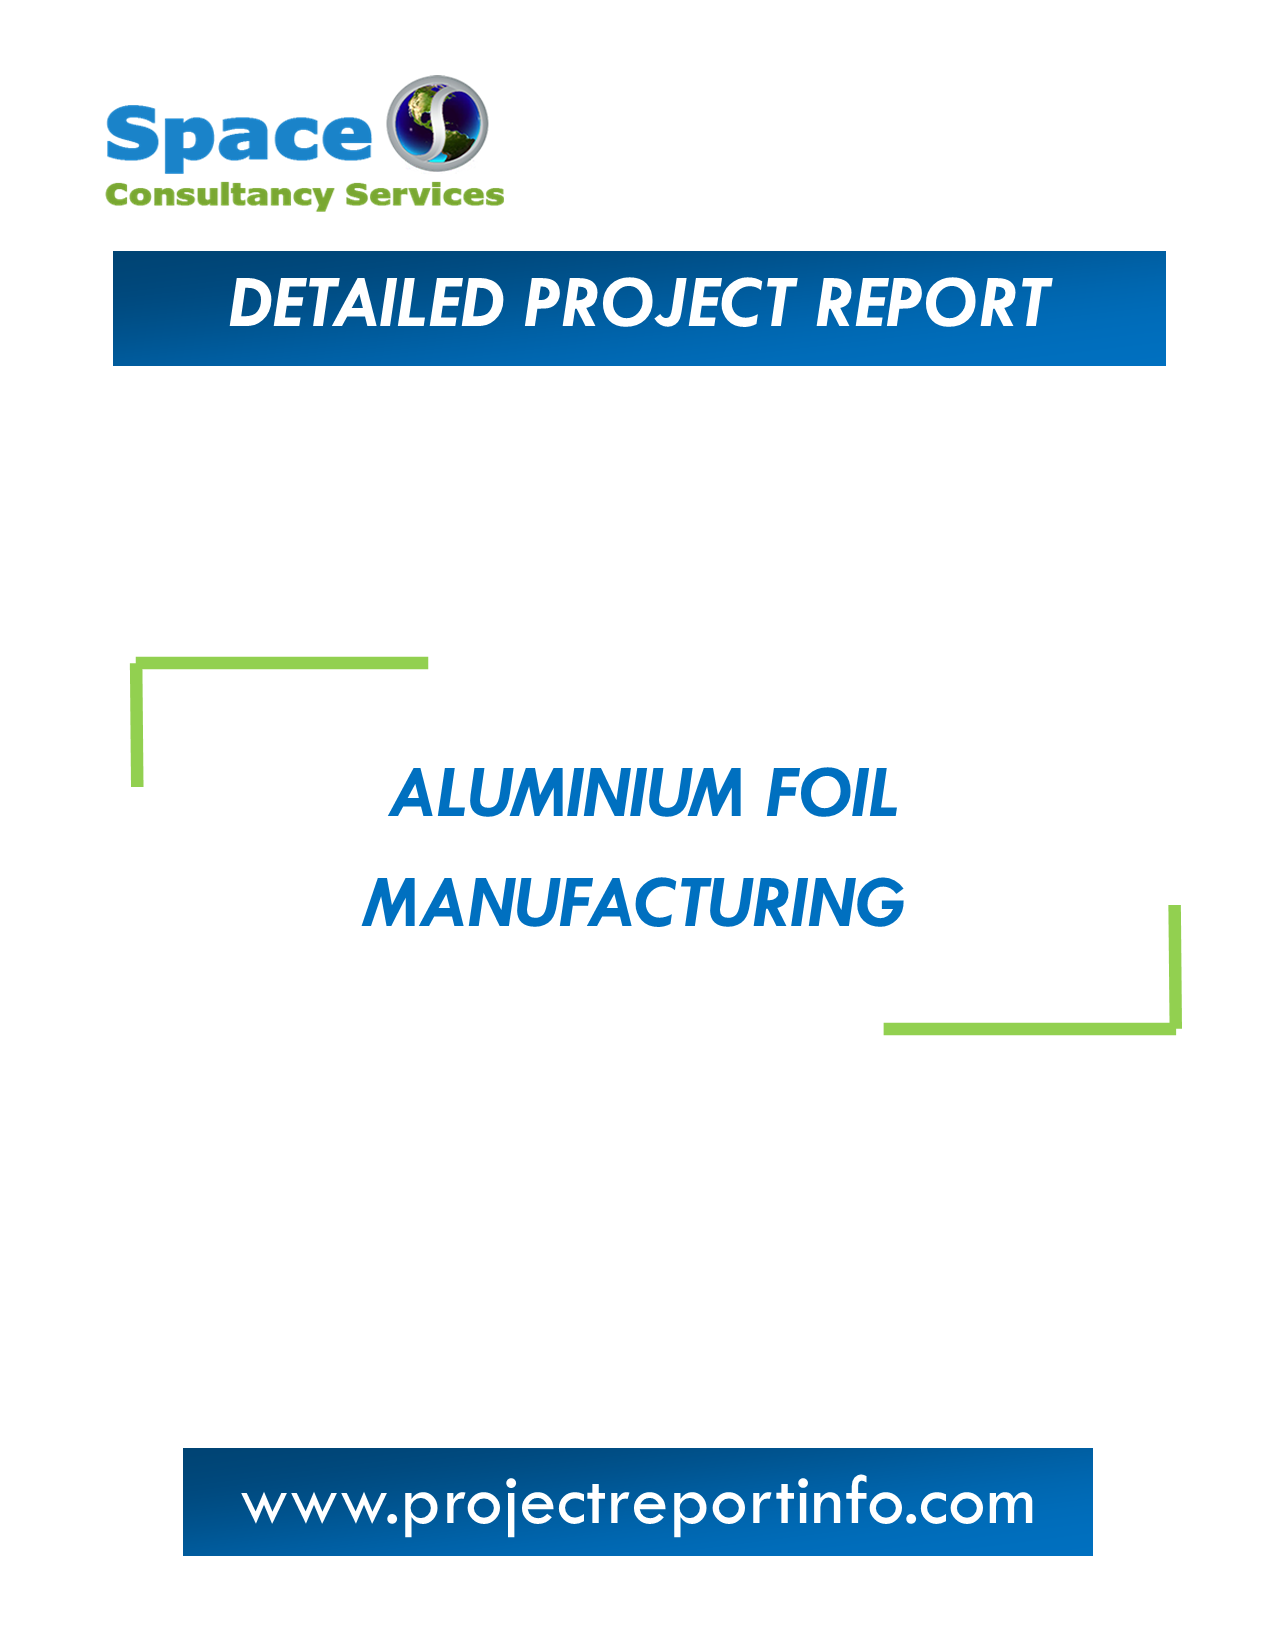 Project Report on Aluminium Foil Manufacturing